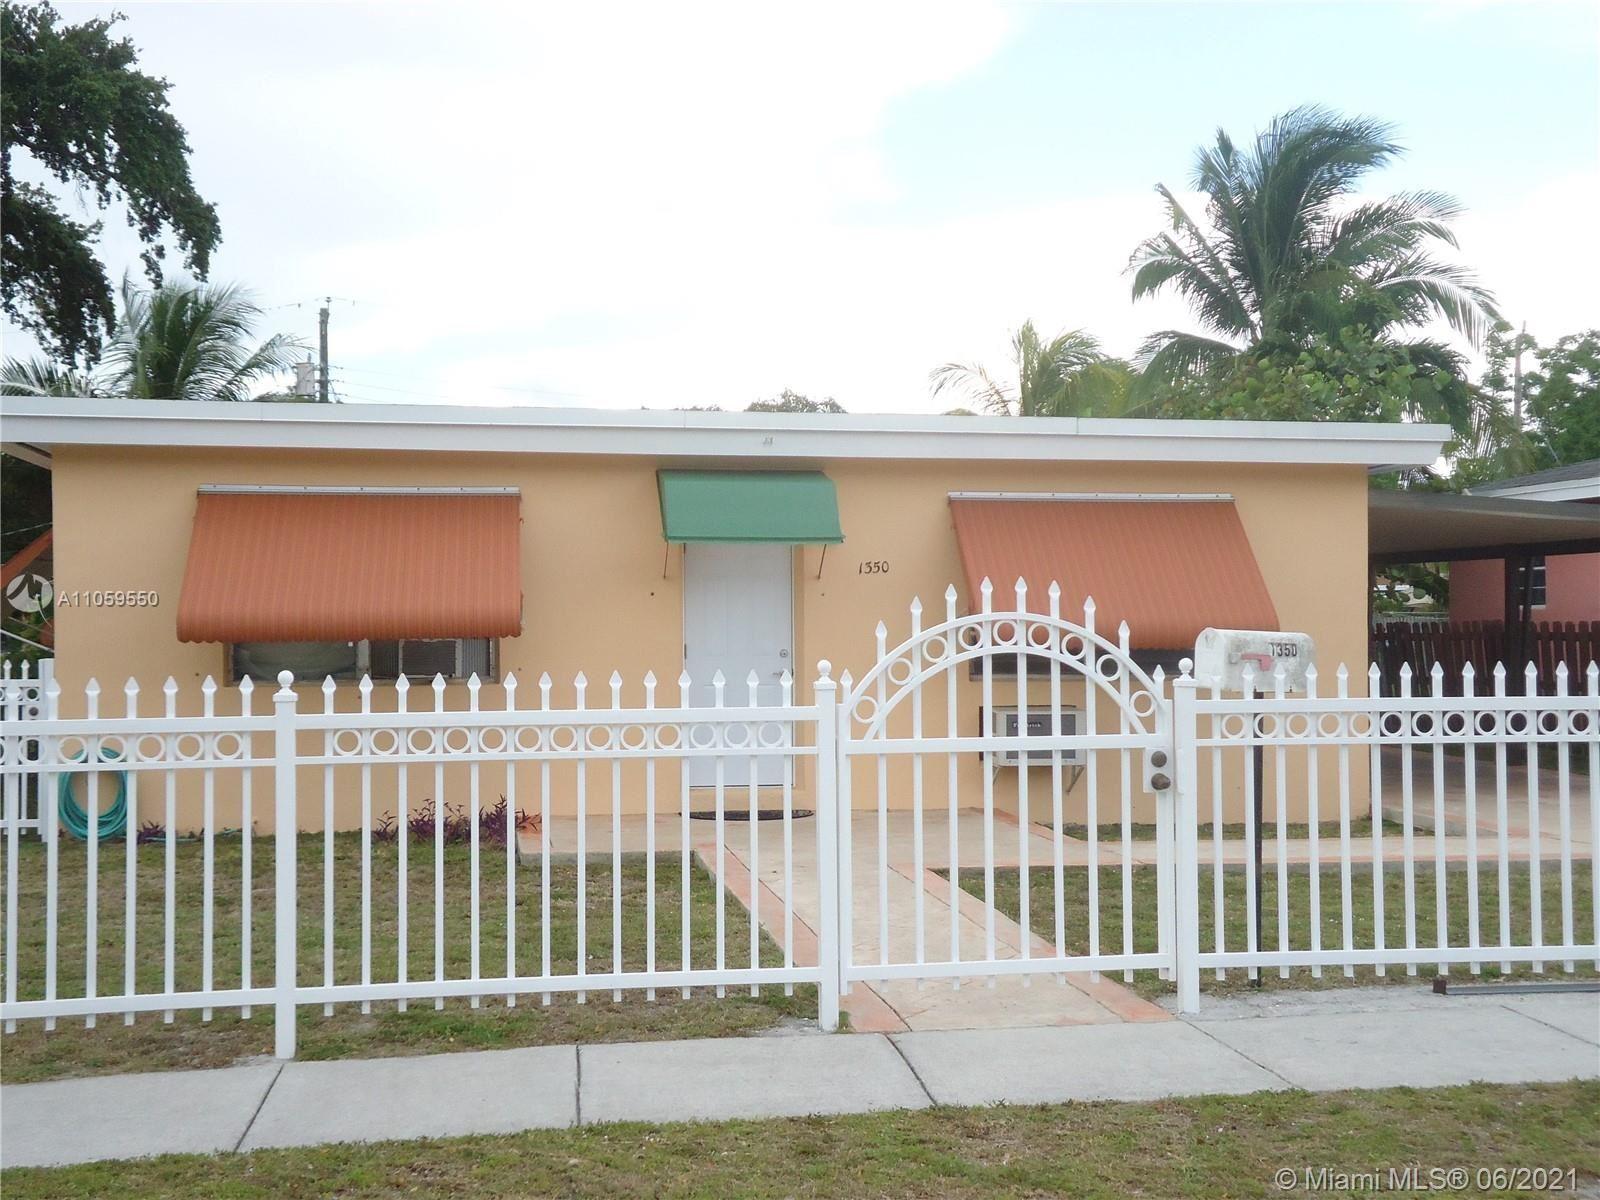 1350 NE 153rd St, North Miami Beach, FL 33162 - #: A11059550